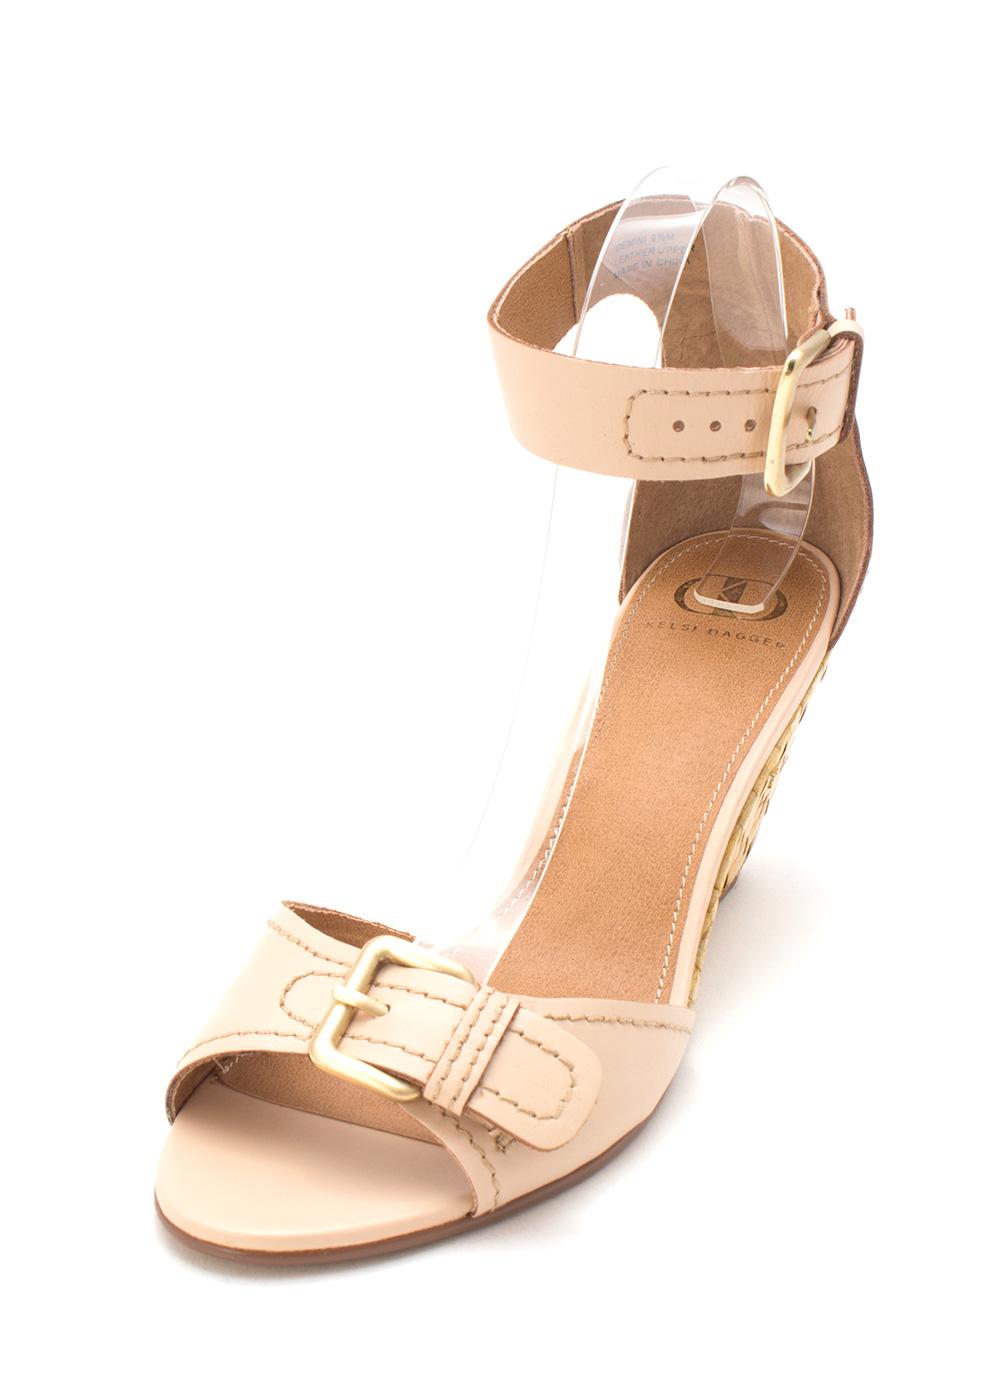 Kelsi Dagger Womens Gemini Leather Open Toe Casual, Nude Leather, Size 9.5